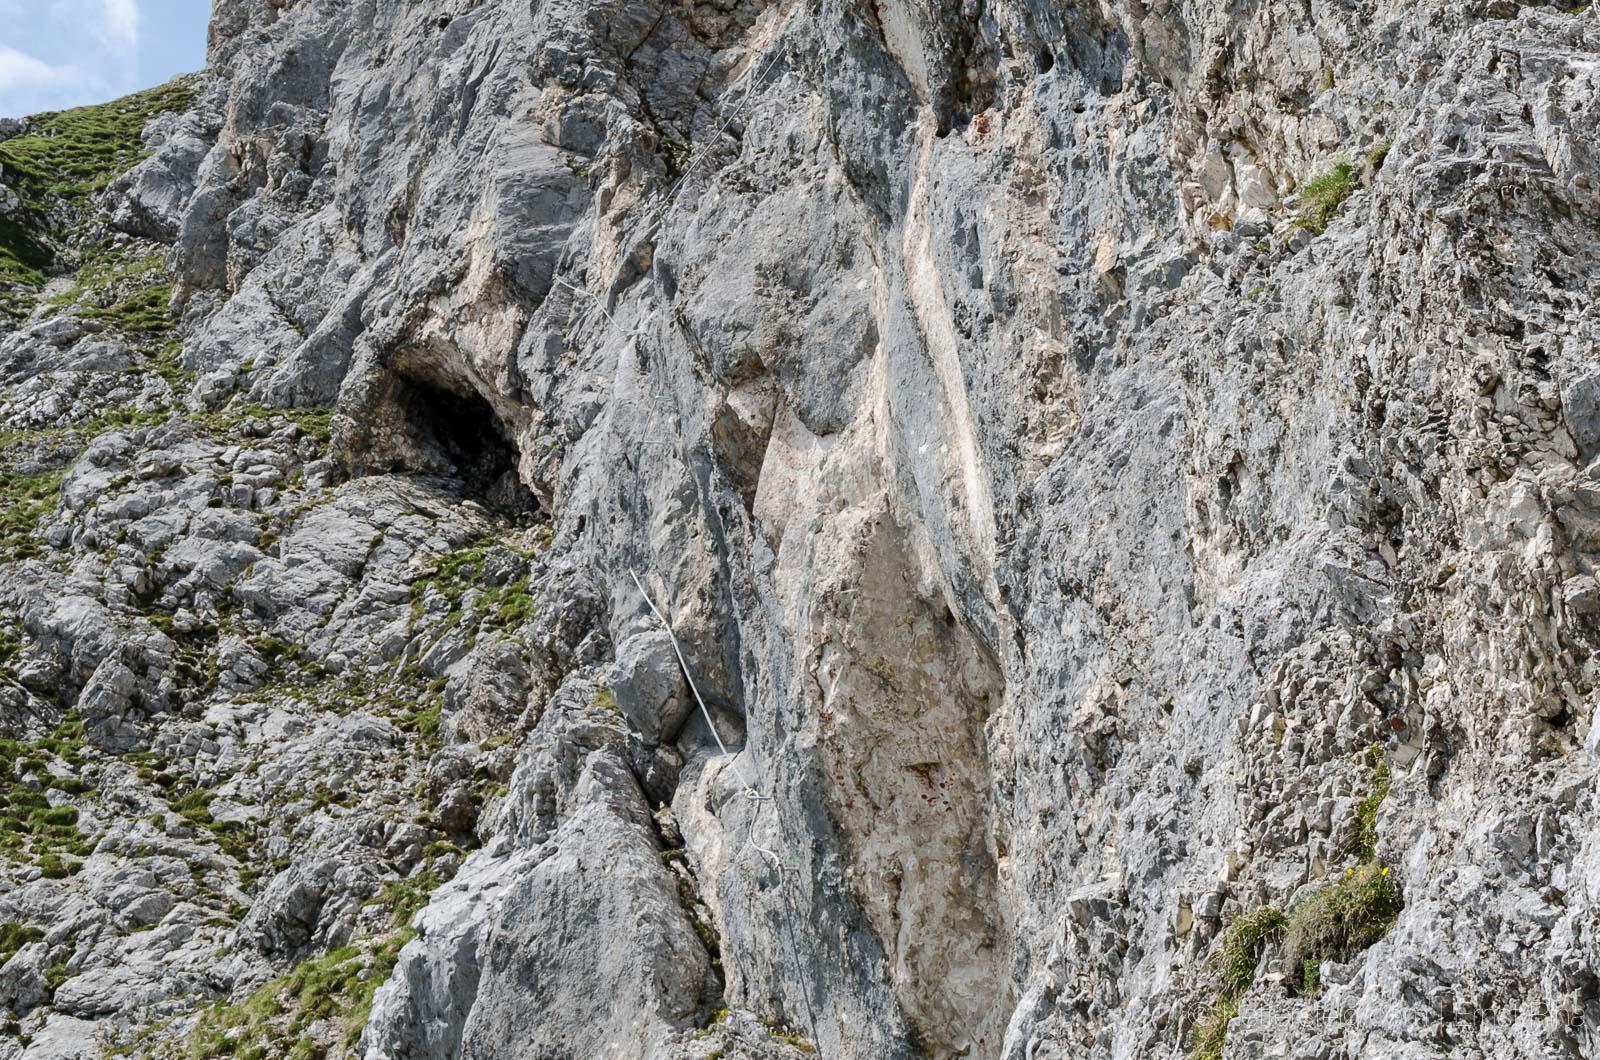 Klettersteig Köllenspitze